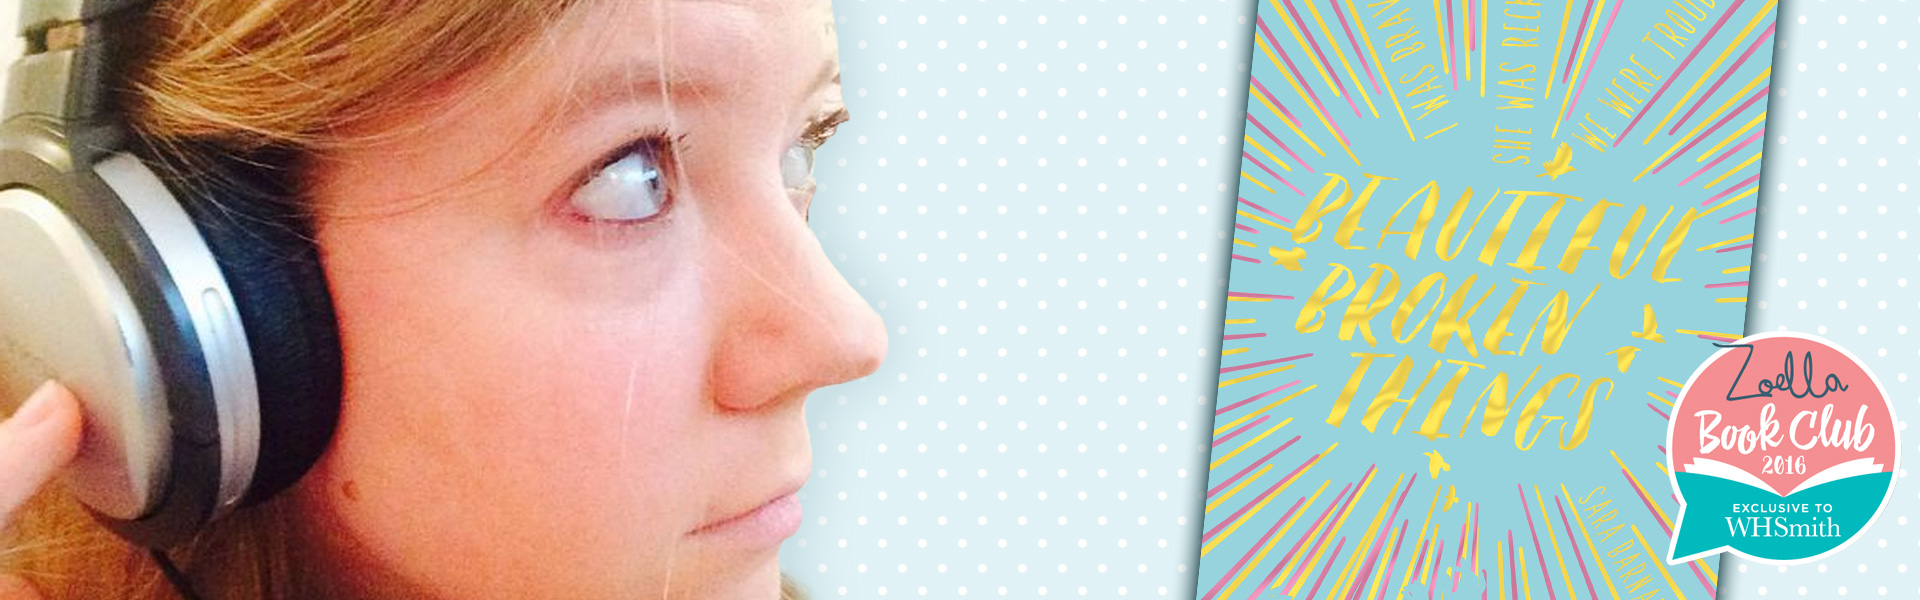 Sara Barnard: Beautiful Broken Things Soundtrack